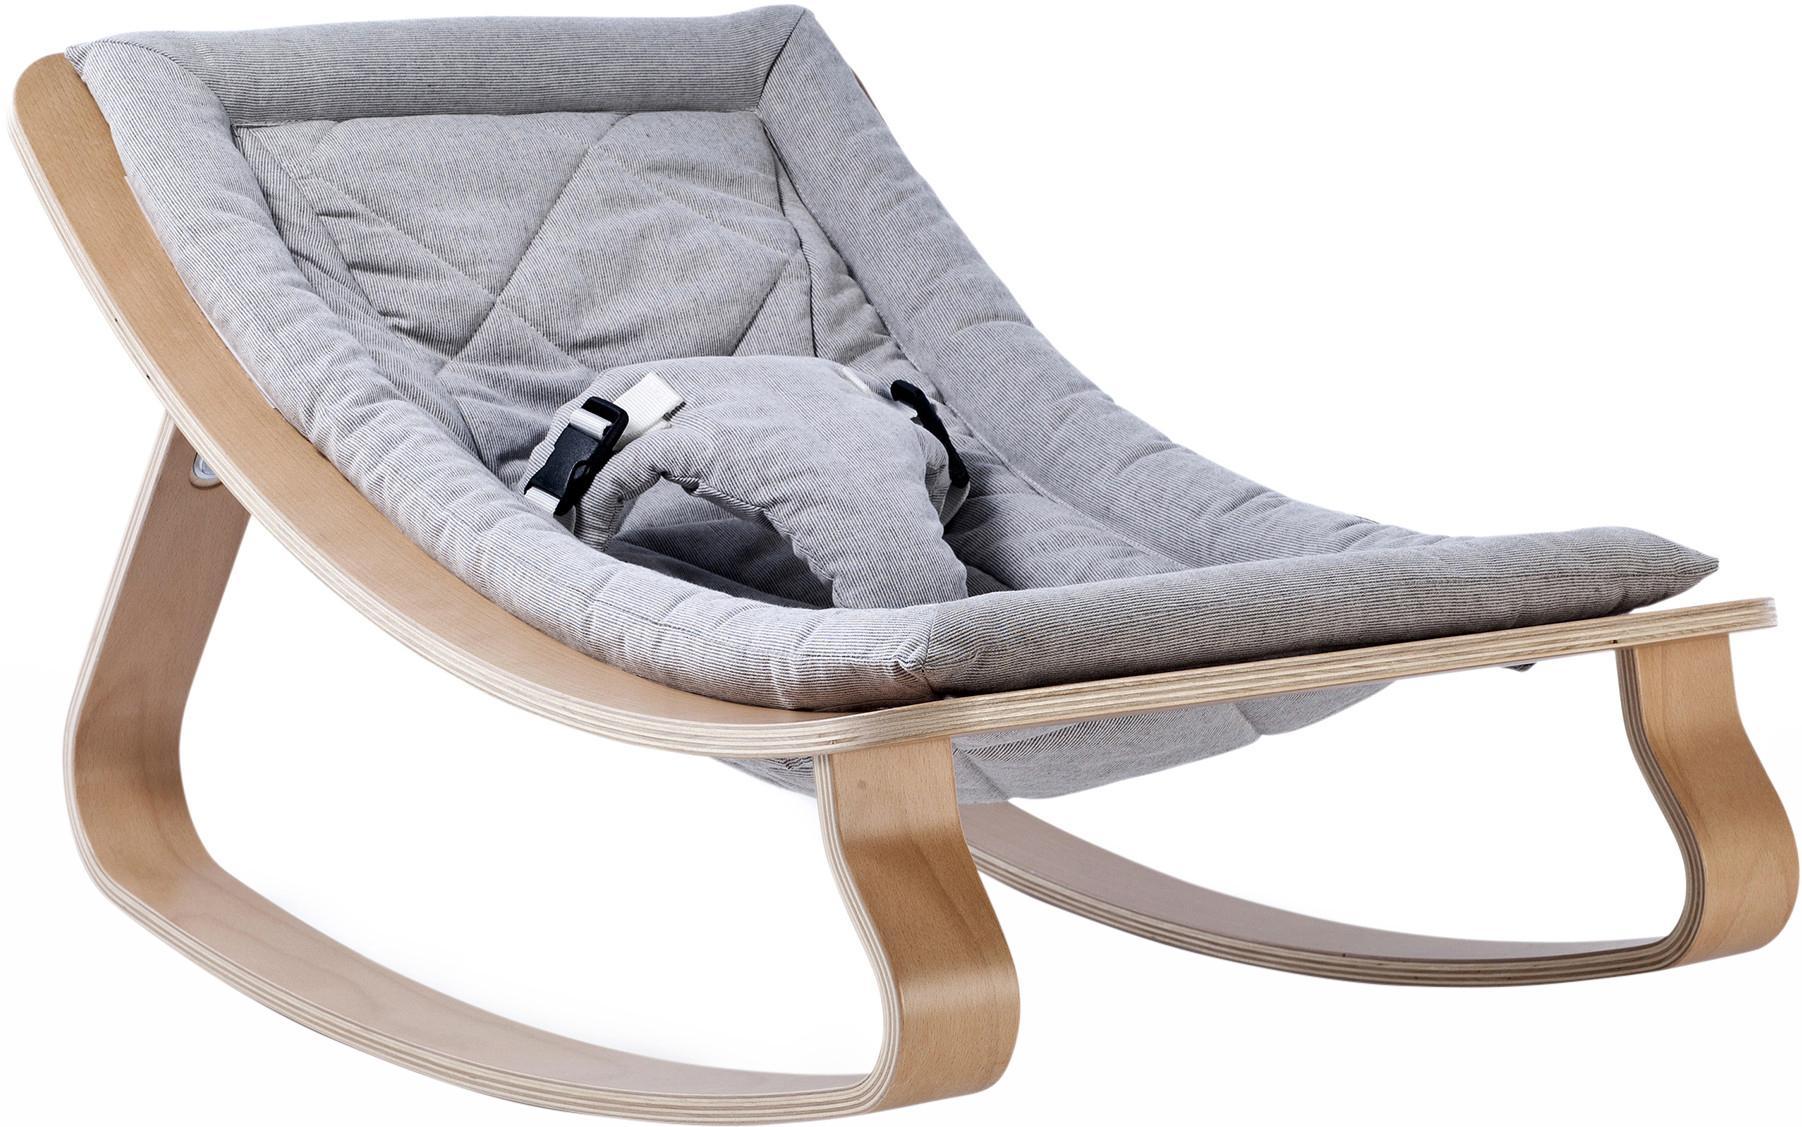 Baby wipstoel Levo, Frame: berkenhout, beukenhout, l, Bekleding: katoen, Lichtbruin, grijs, 70 x 40 cm